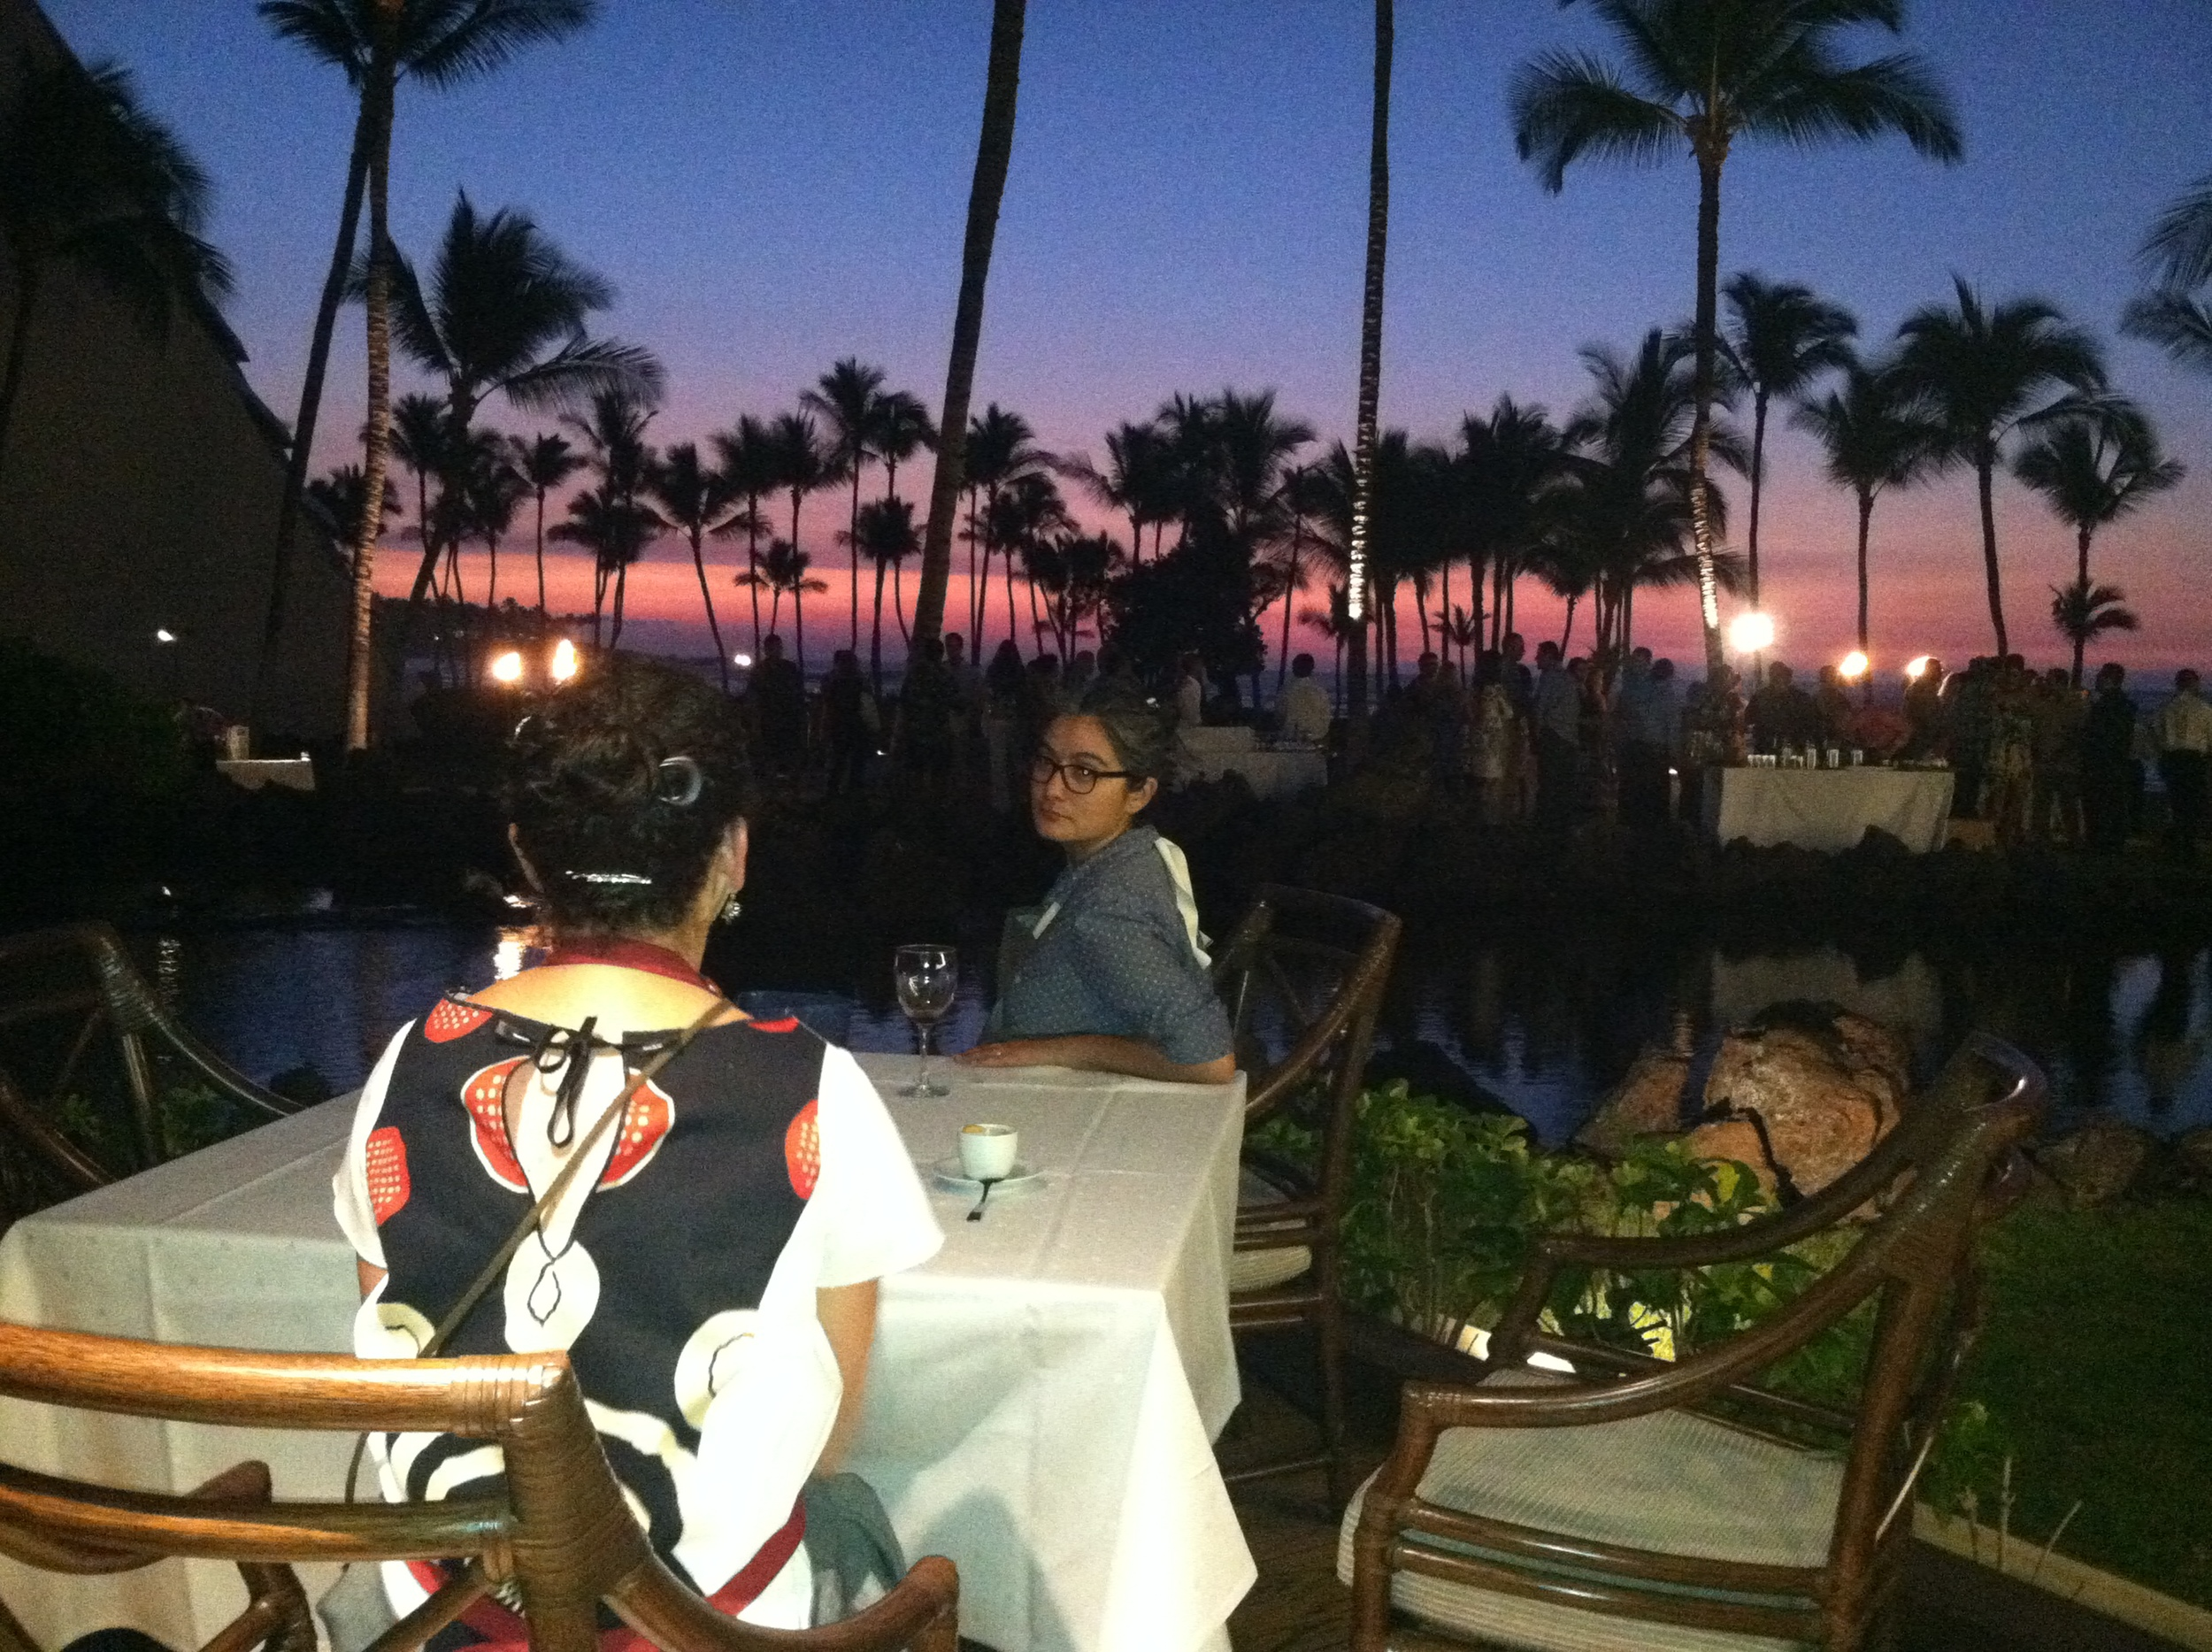 Secret meeting was held in Kona, Hawaii to retake #1 spot in World Gelato Ratings